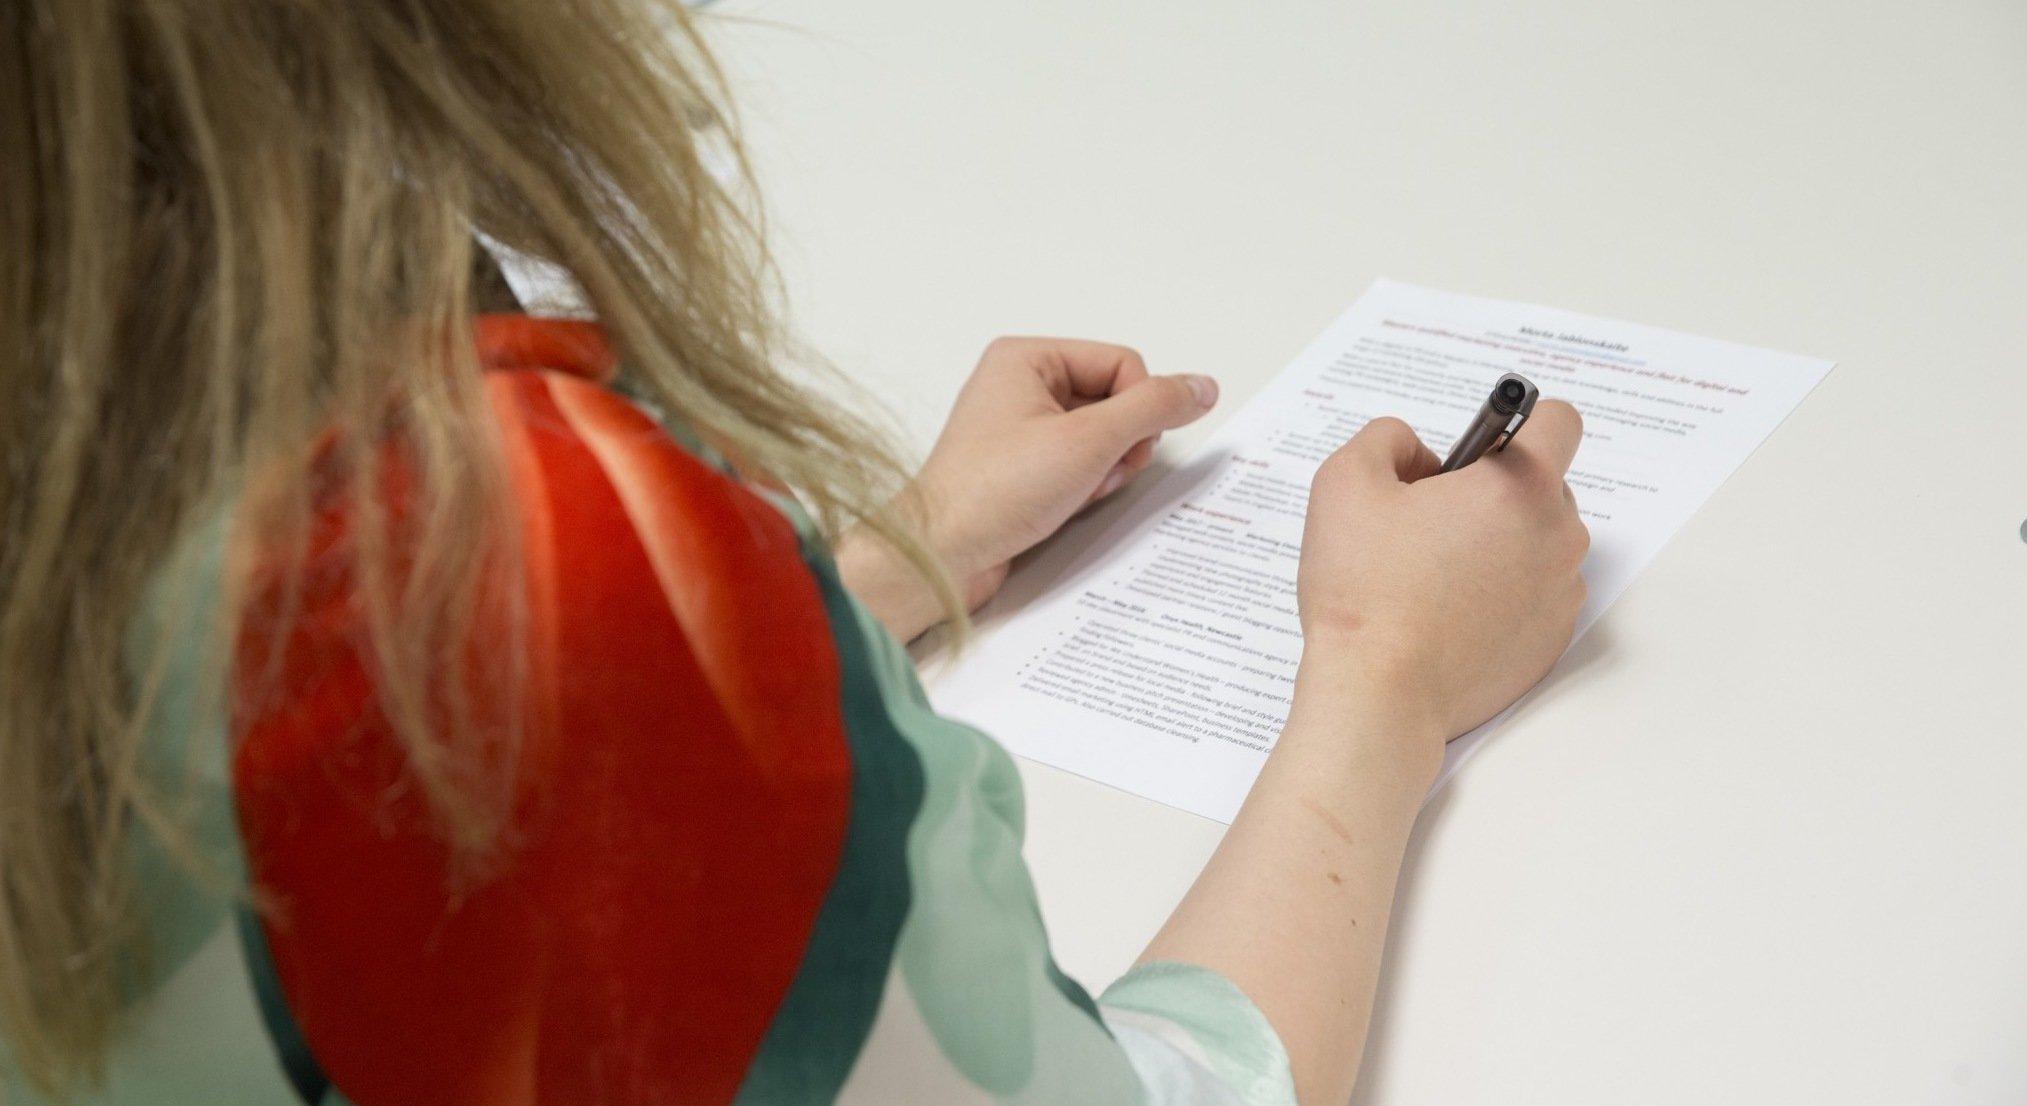 Cv writing service middlesbrough